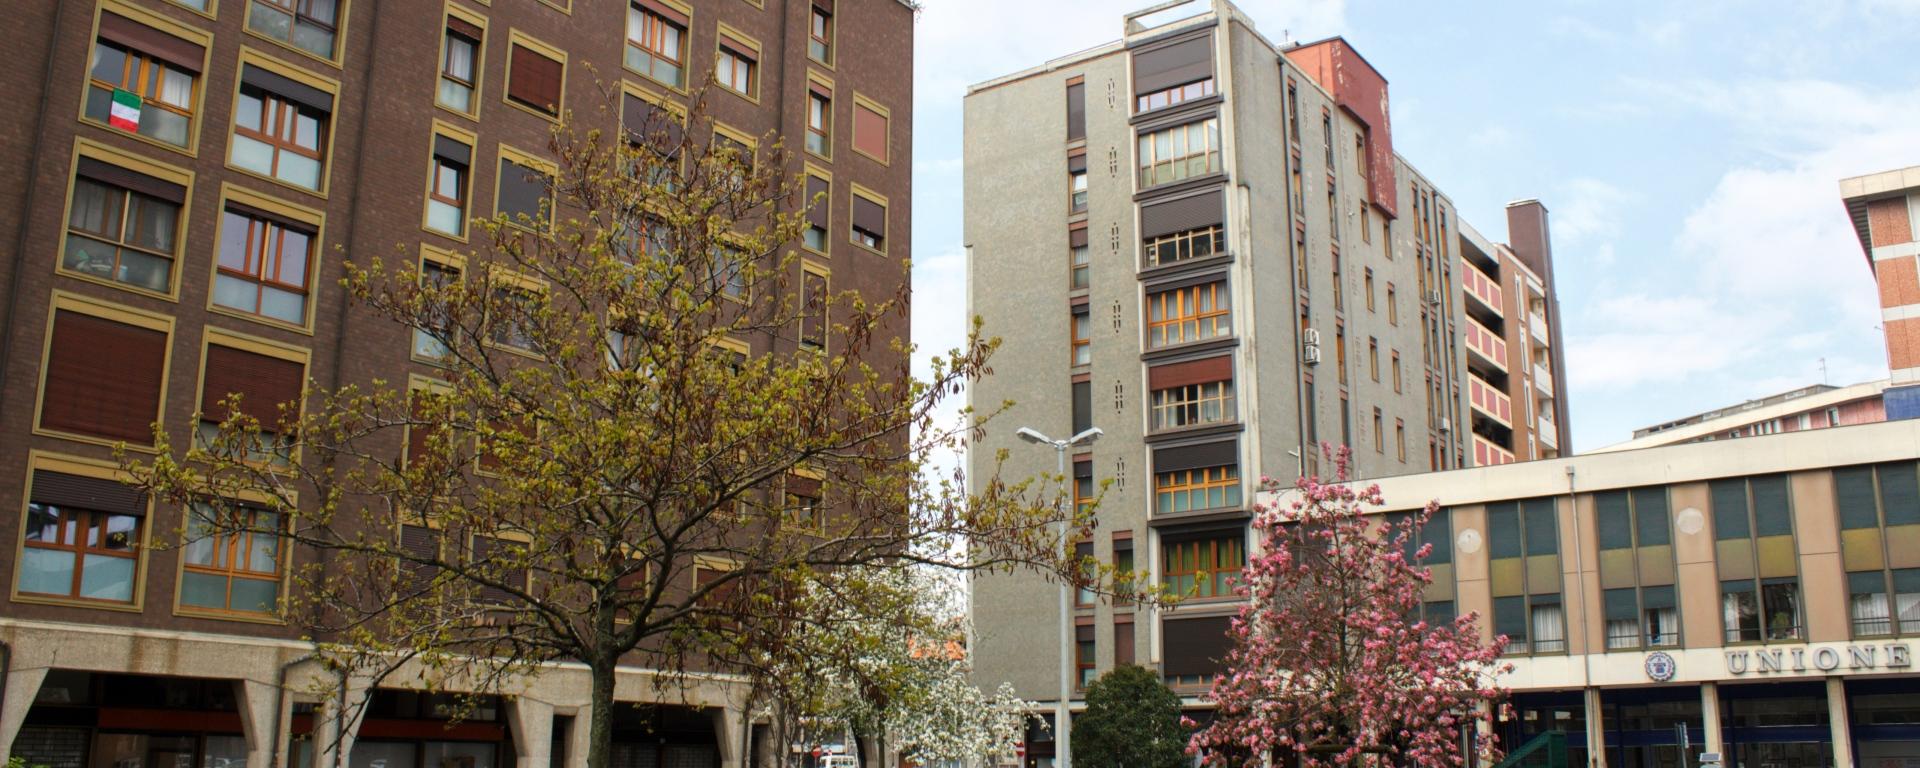 padova rigenerazione urbana